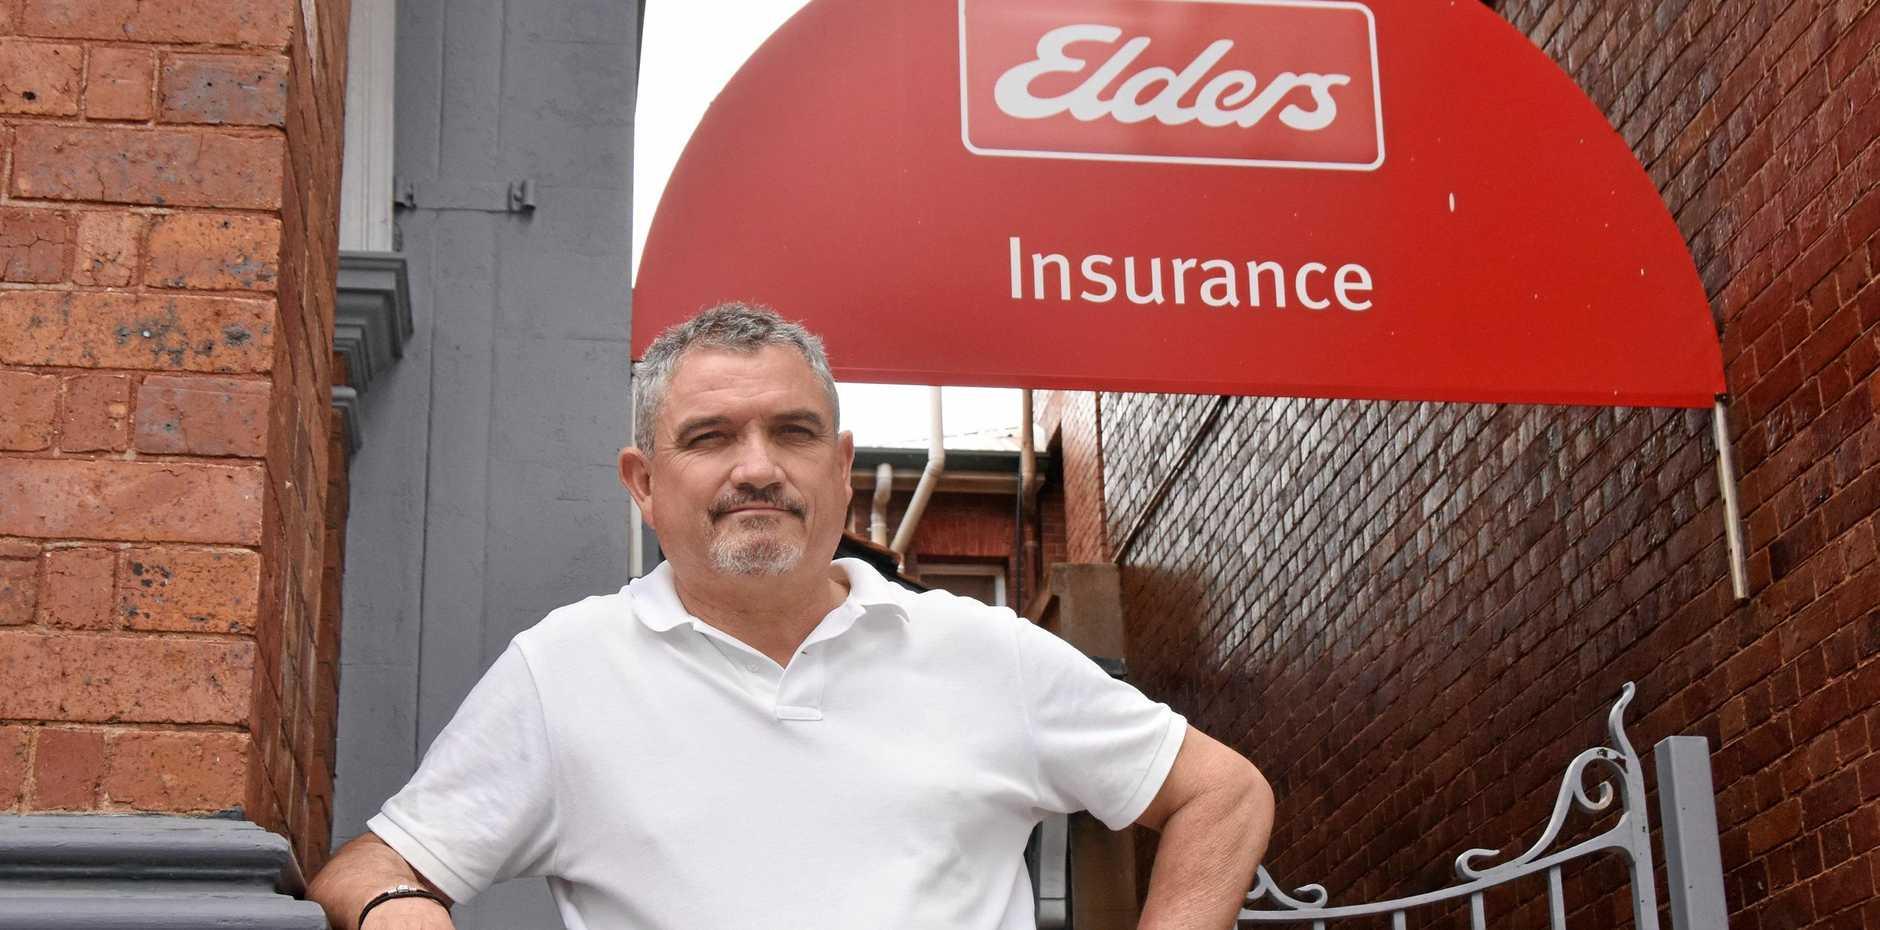 Elders Insurance Warwick insurance agent Warren Webster is celebrating 20 years since the business opened its doors in town.